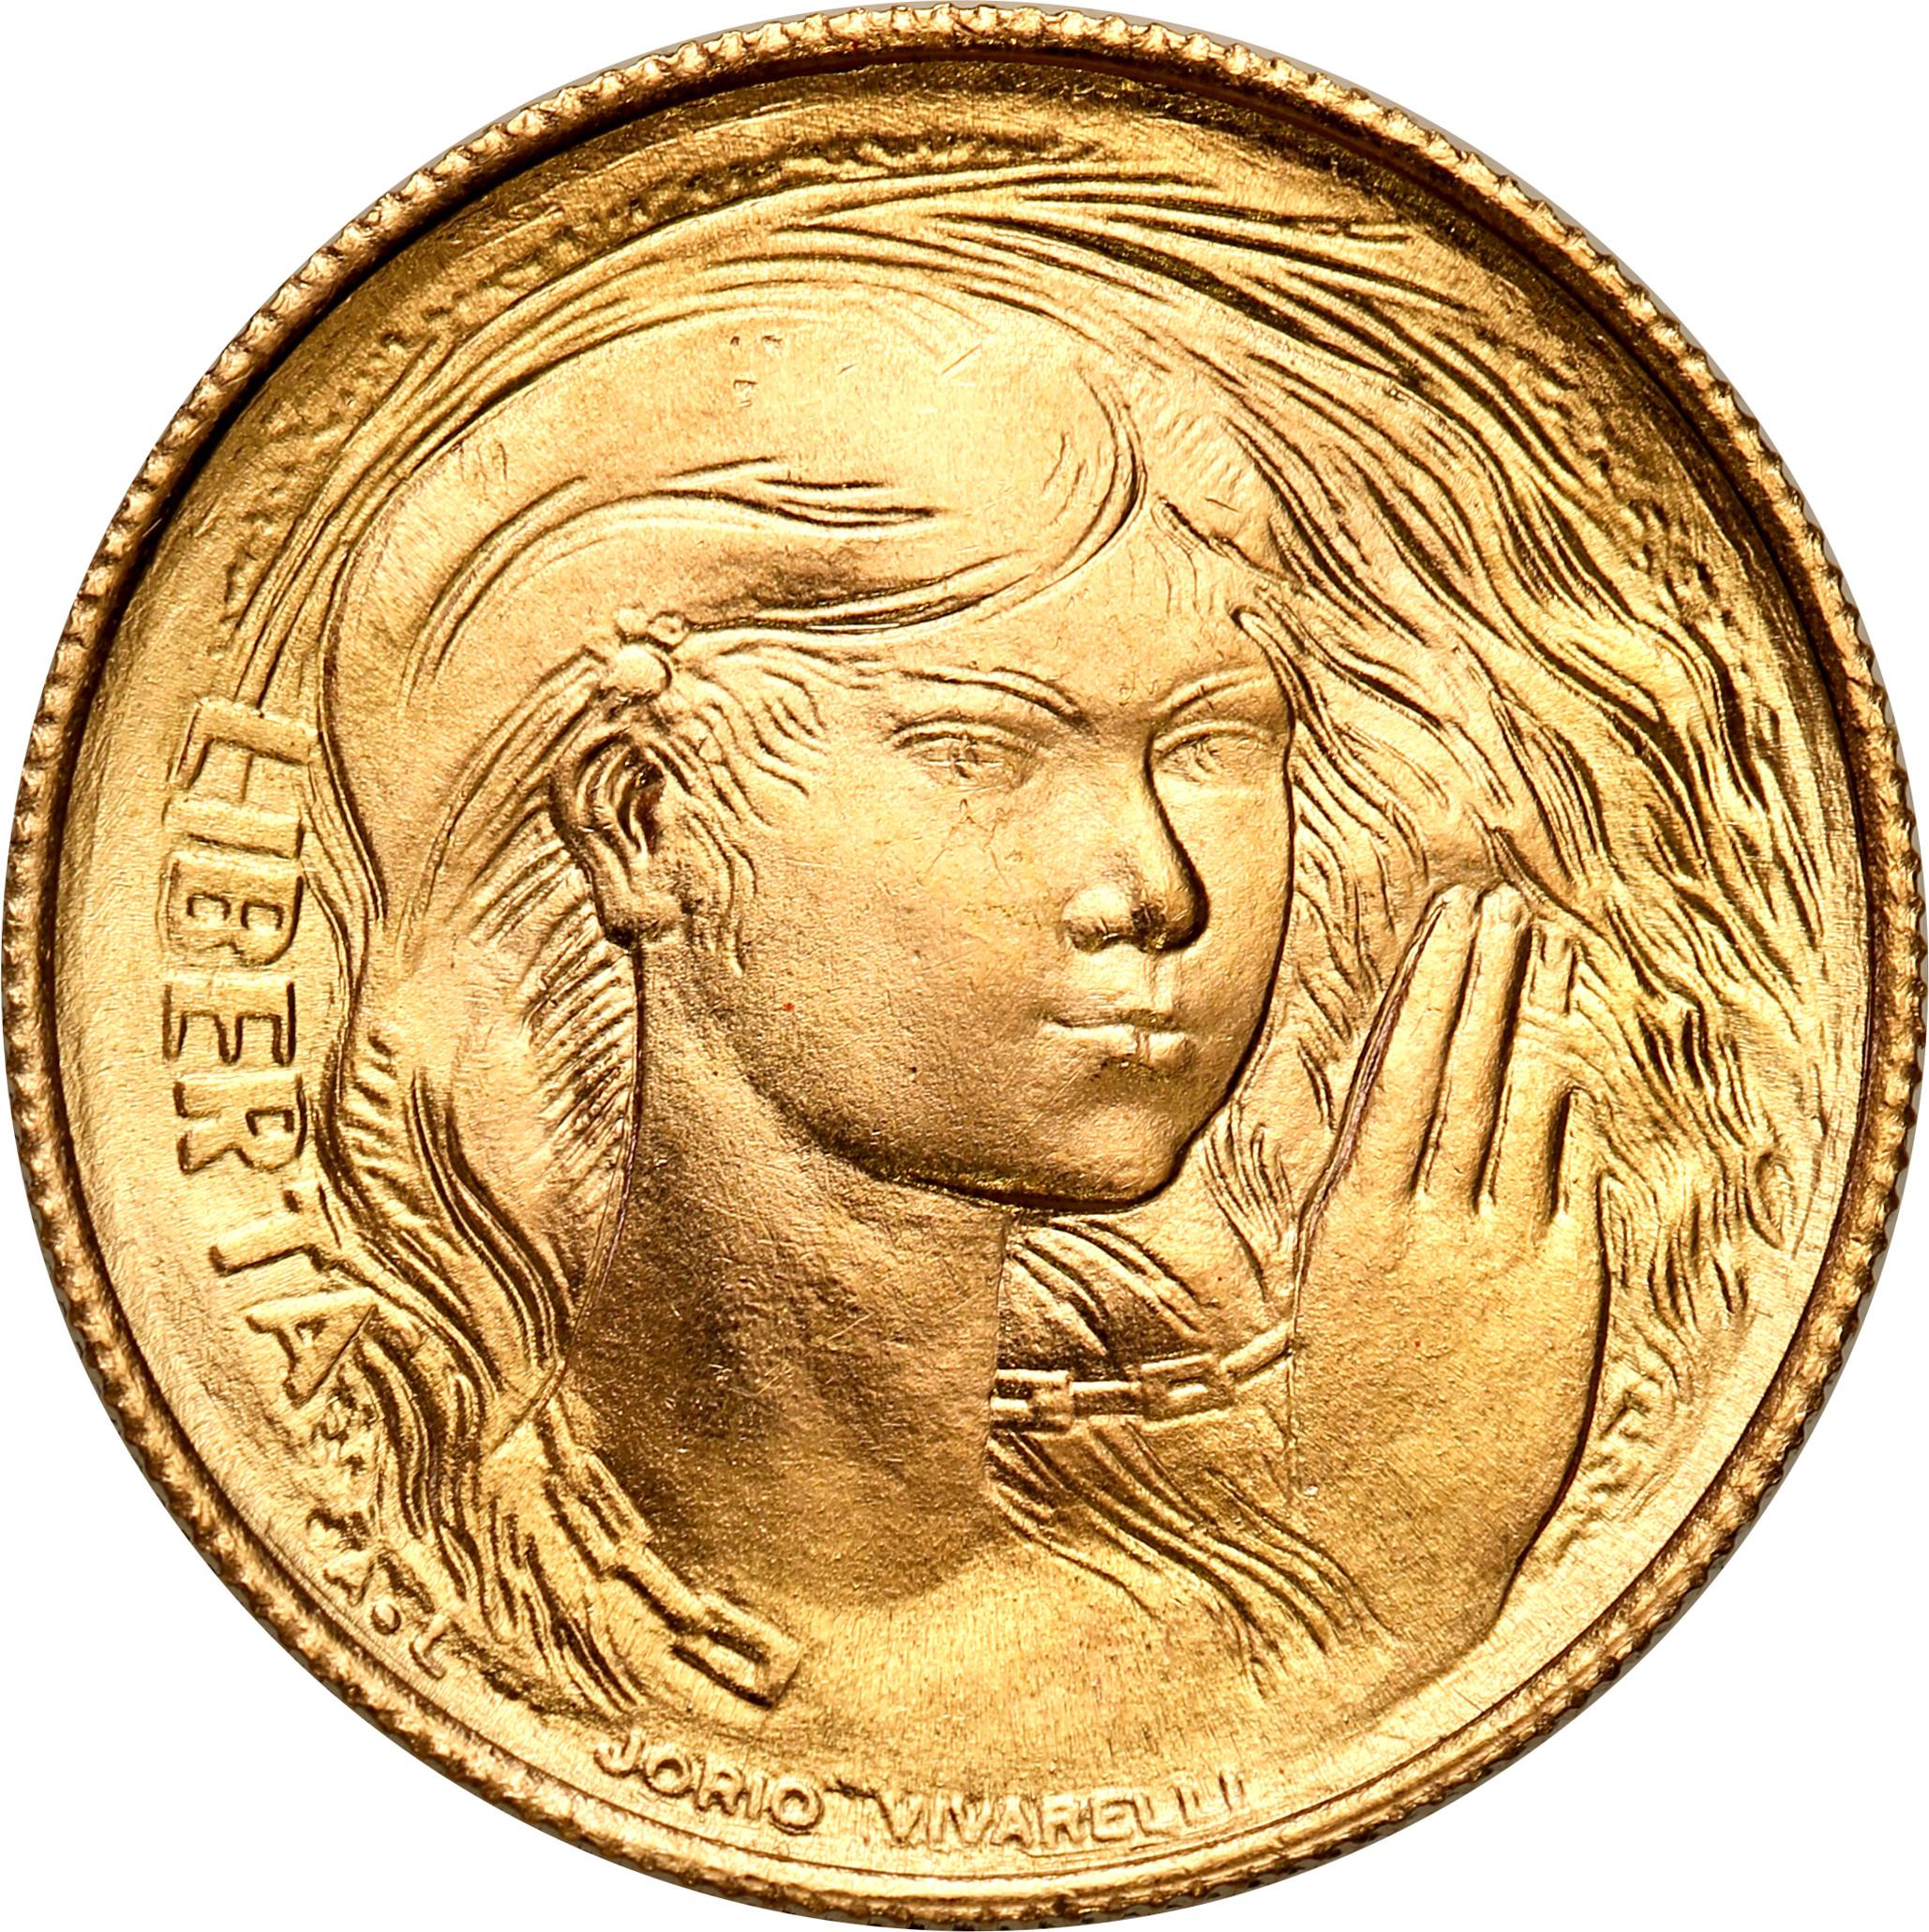 San Marino, 2 scudo 1978, st. 1